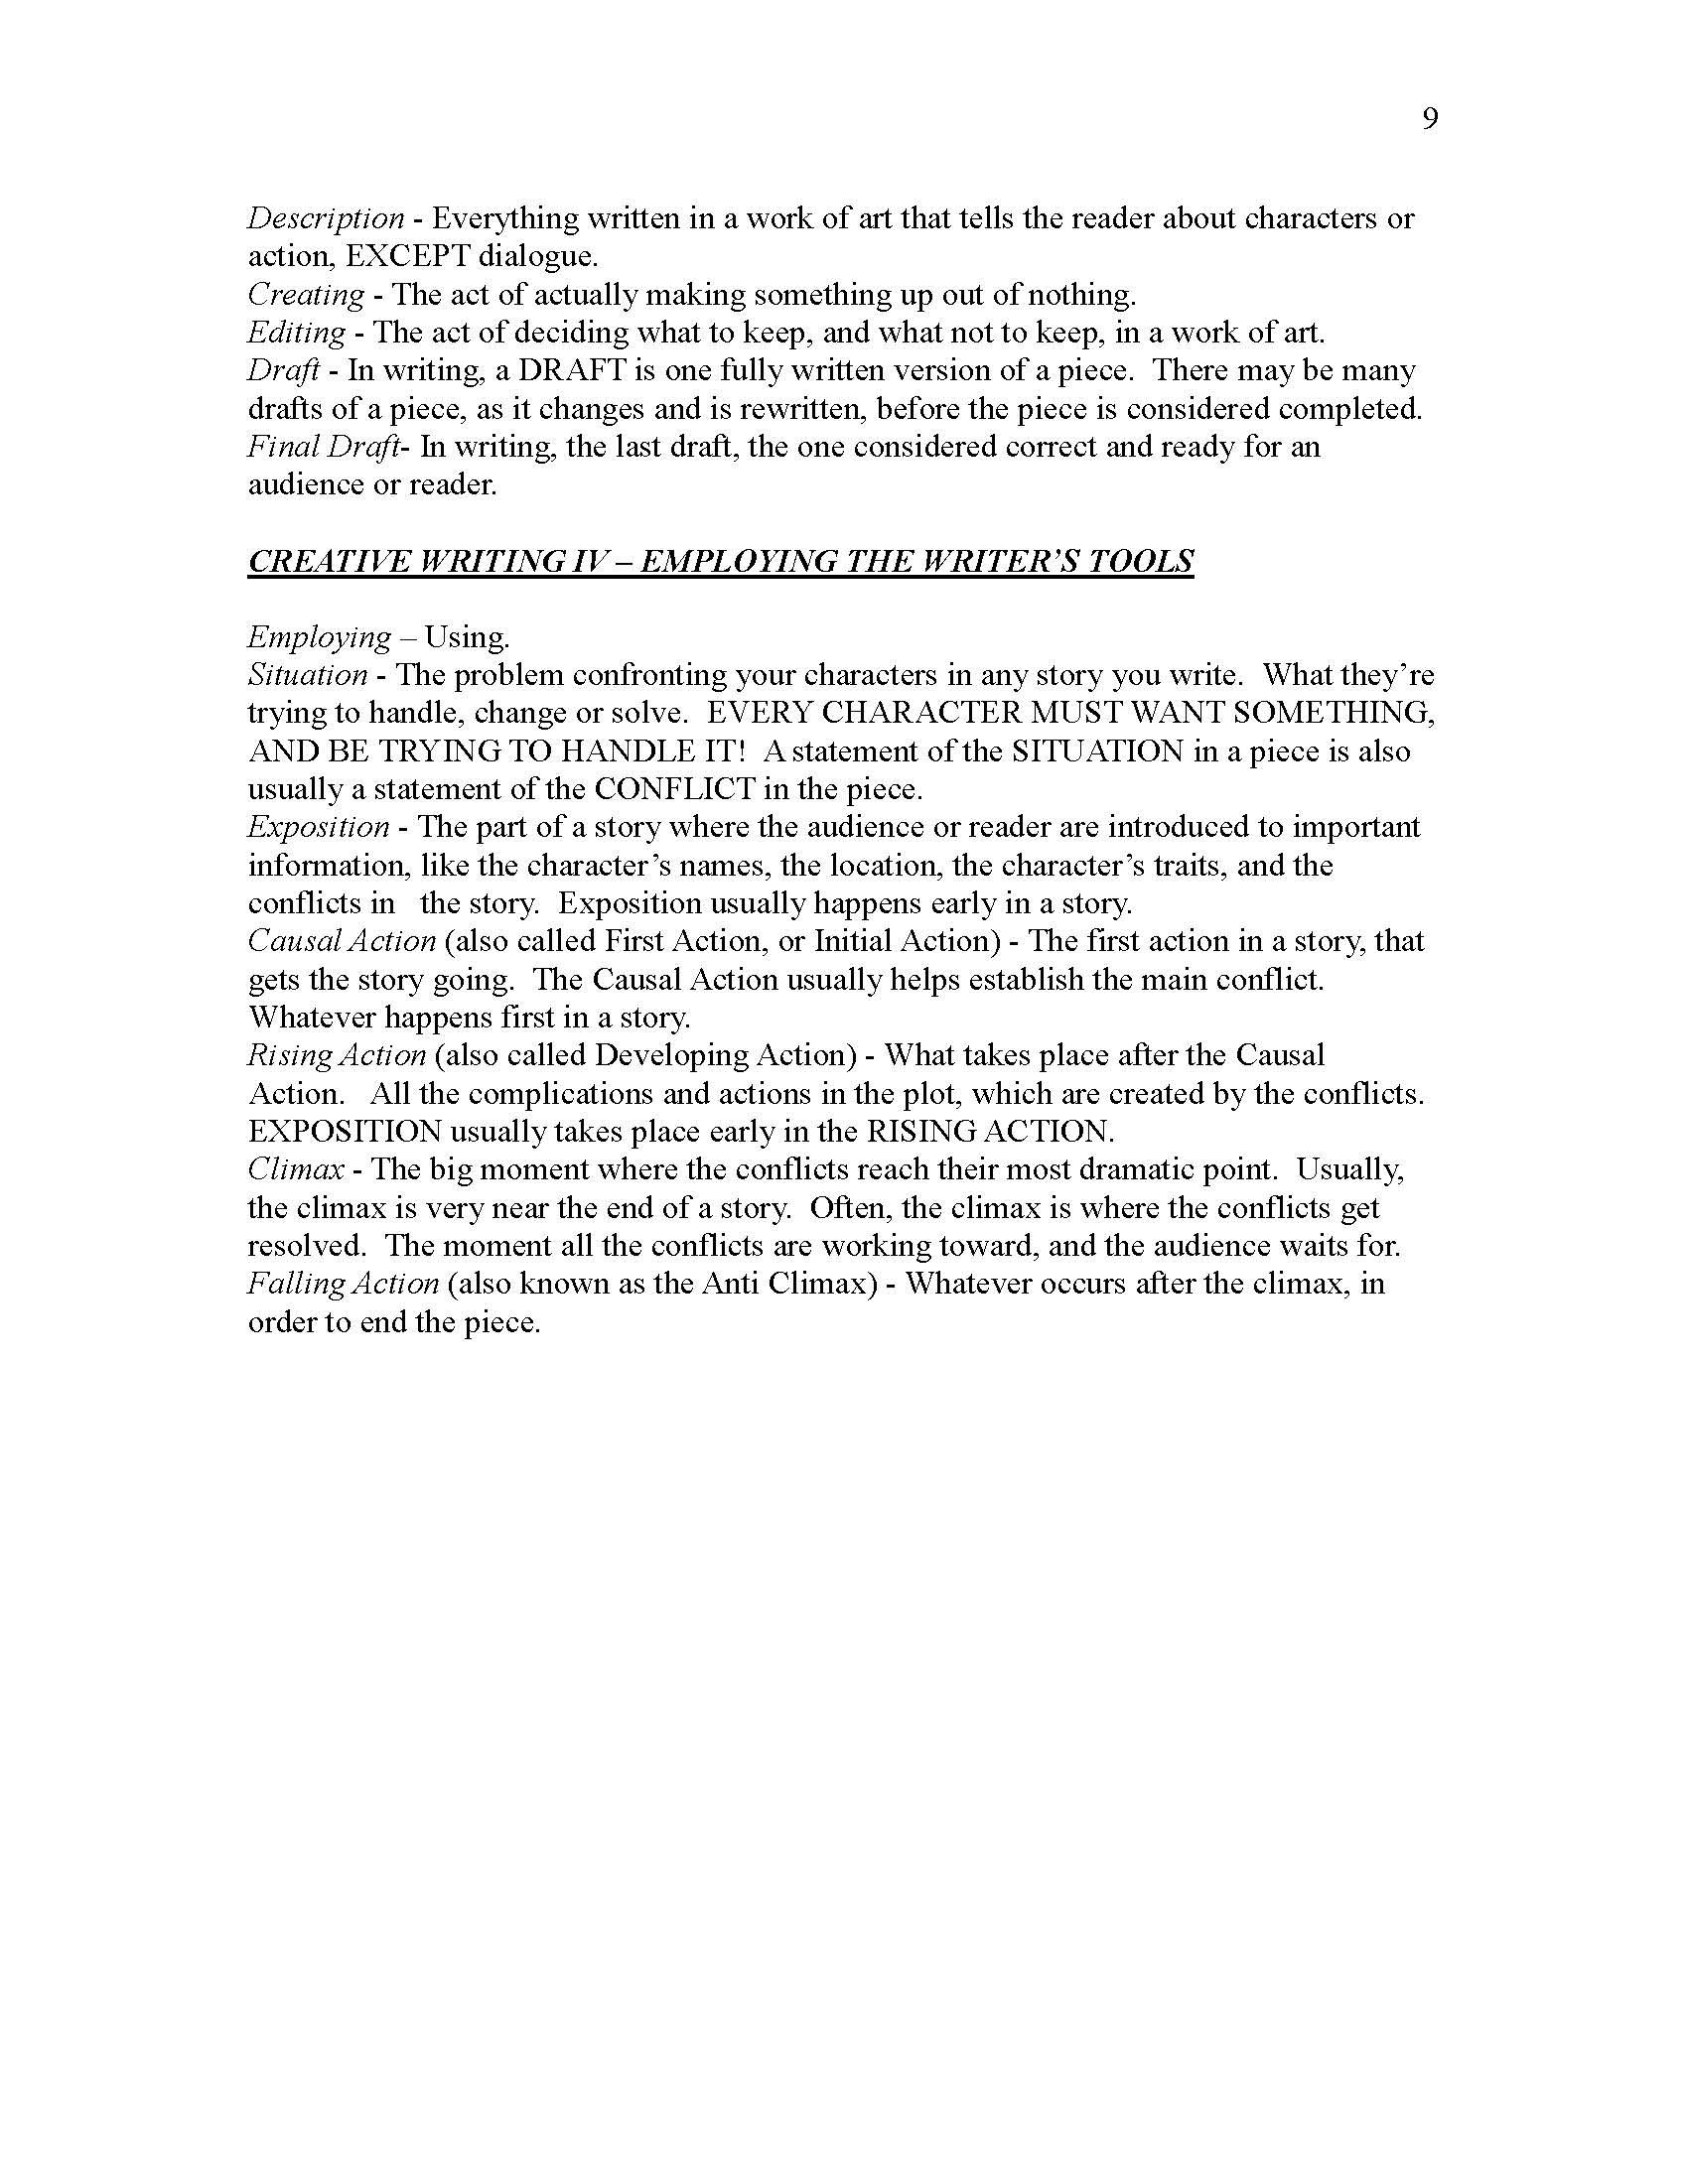 Step 4 Creative Writing 5 - The Field_Page_010.jpg